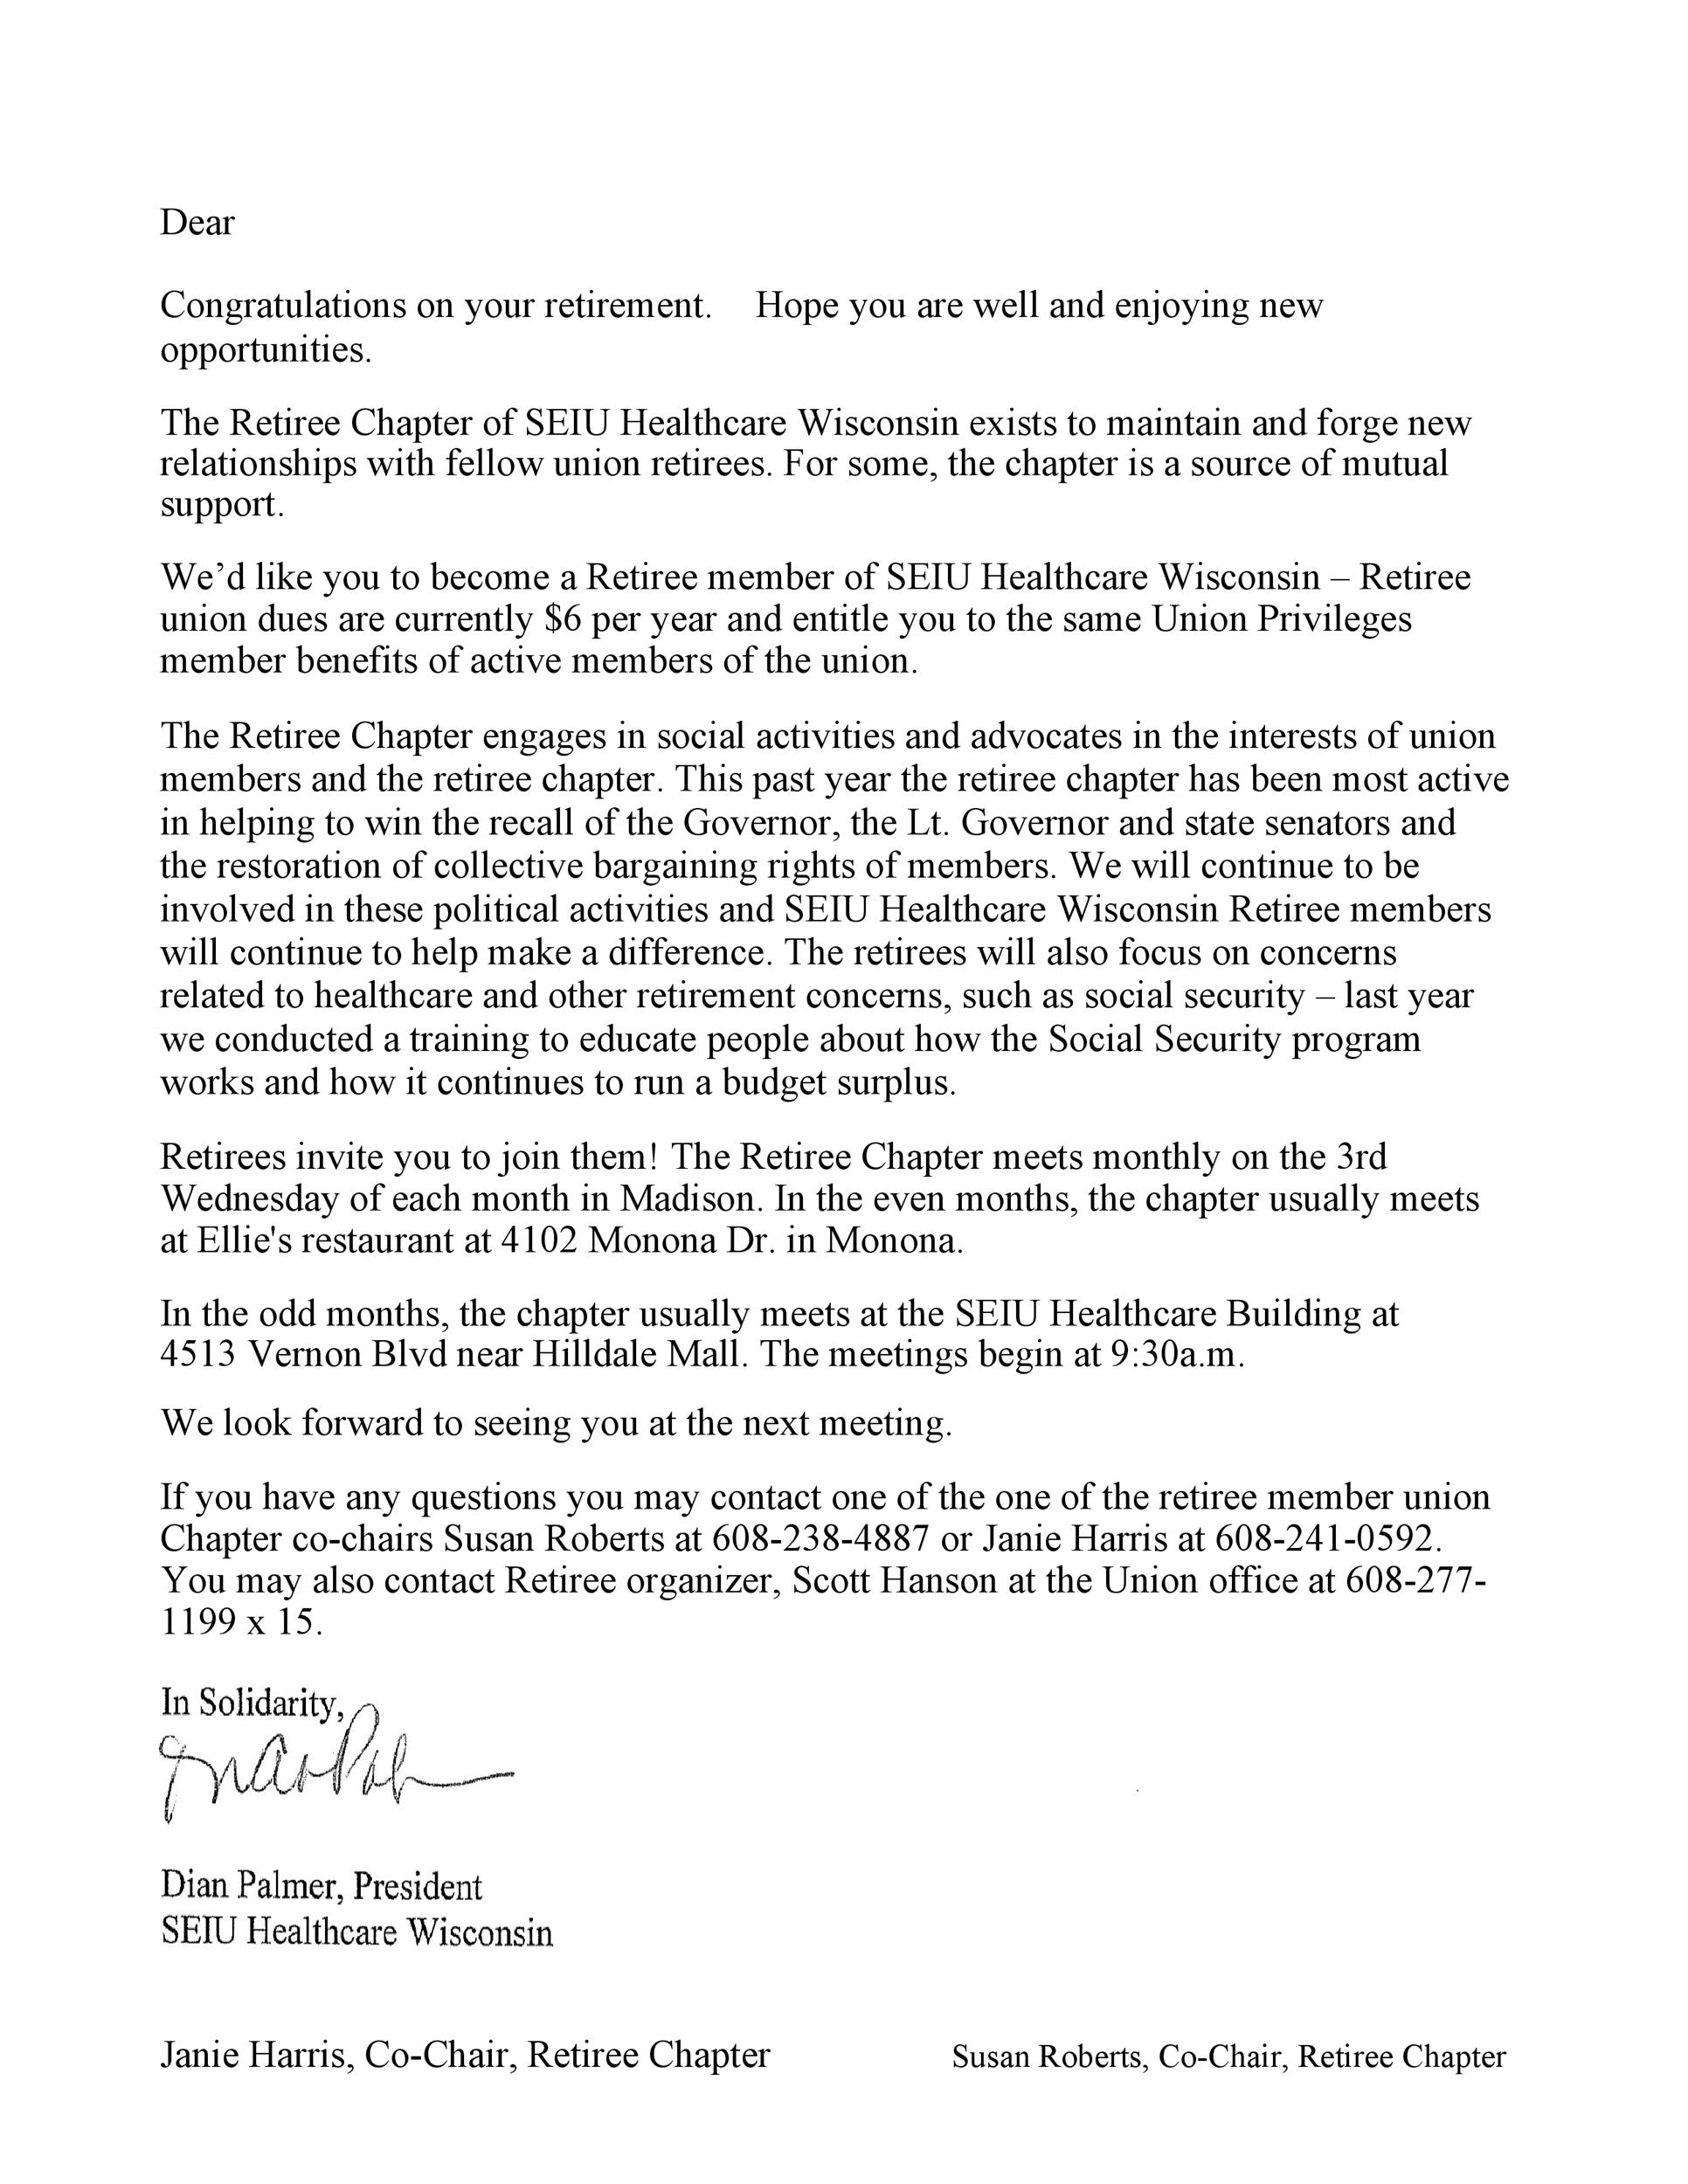 Free congratulations letter 03